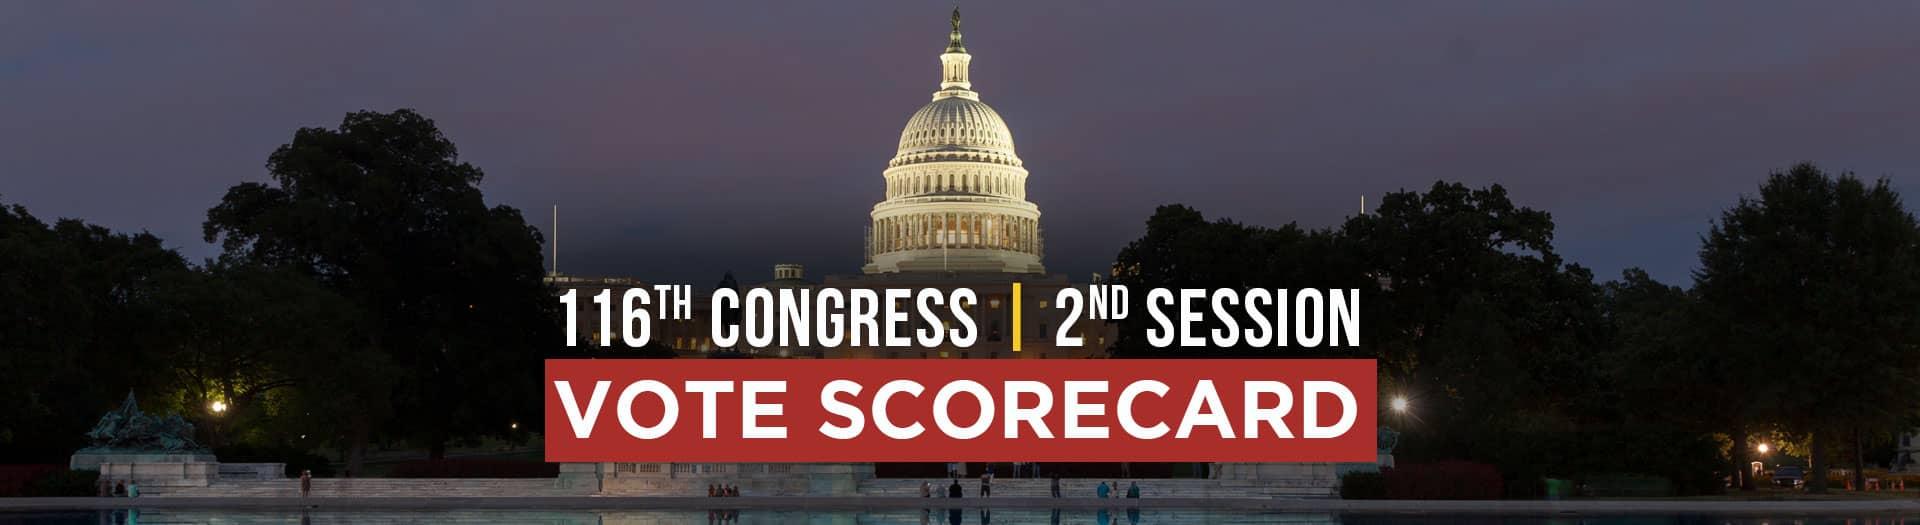 congress scorecard